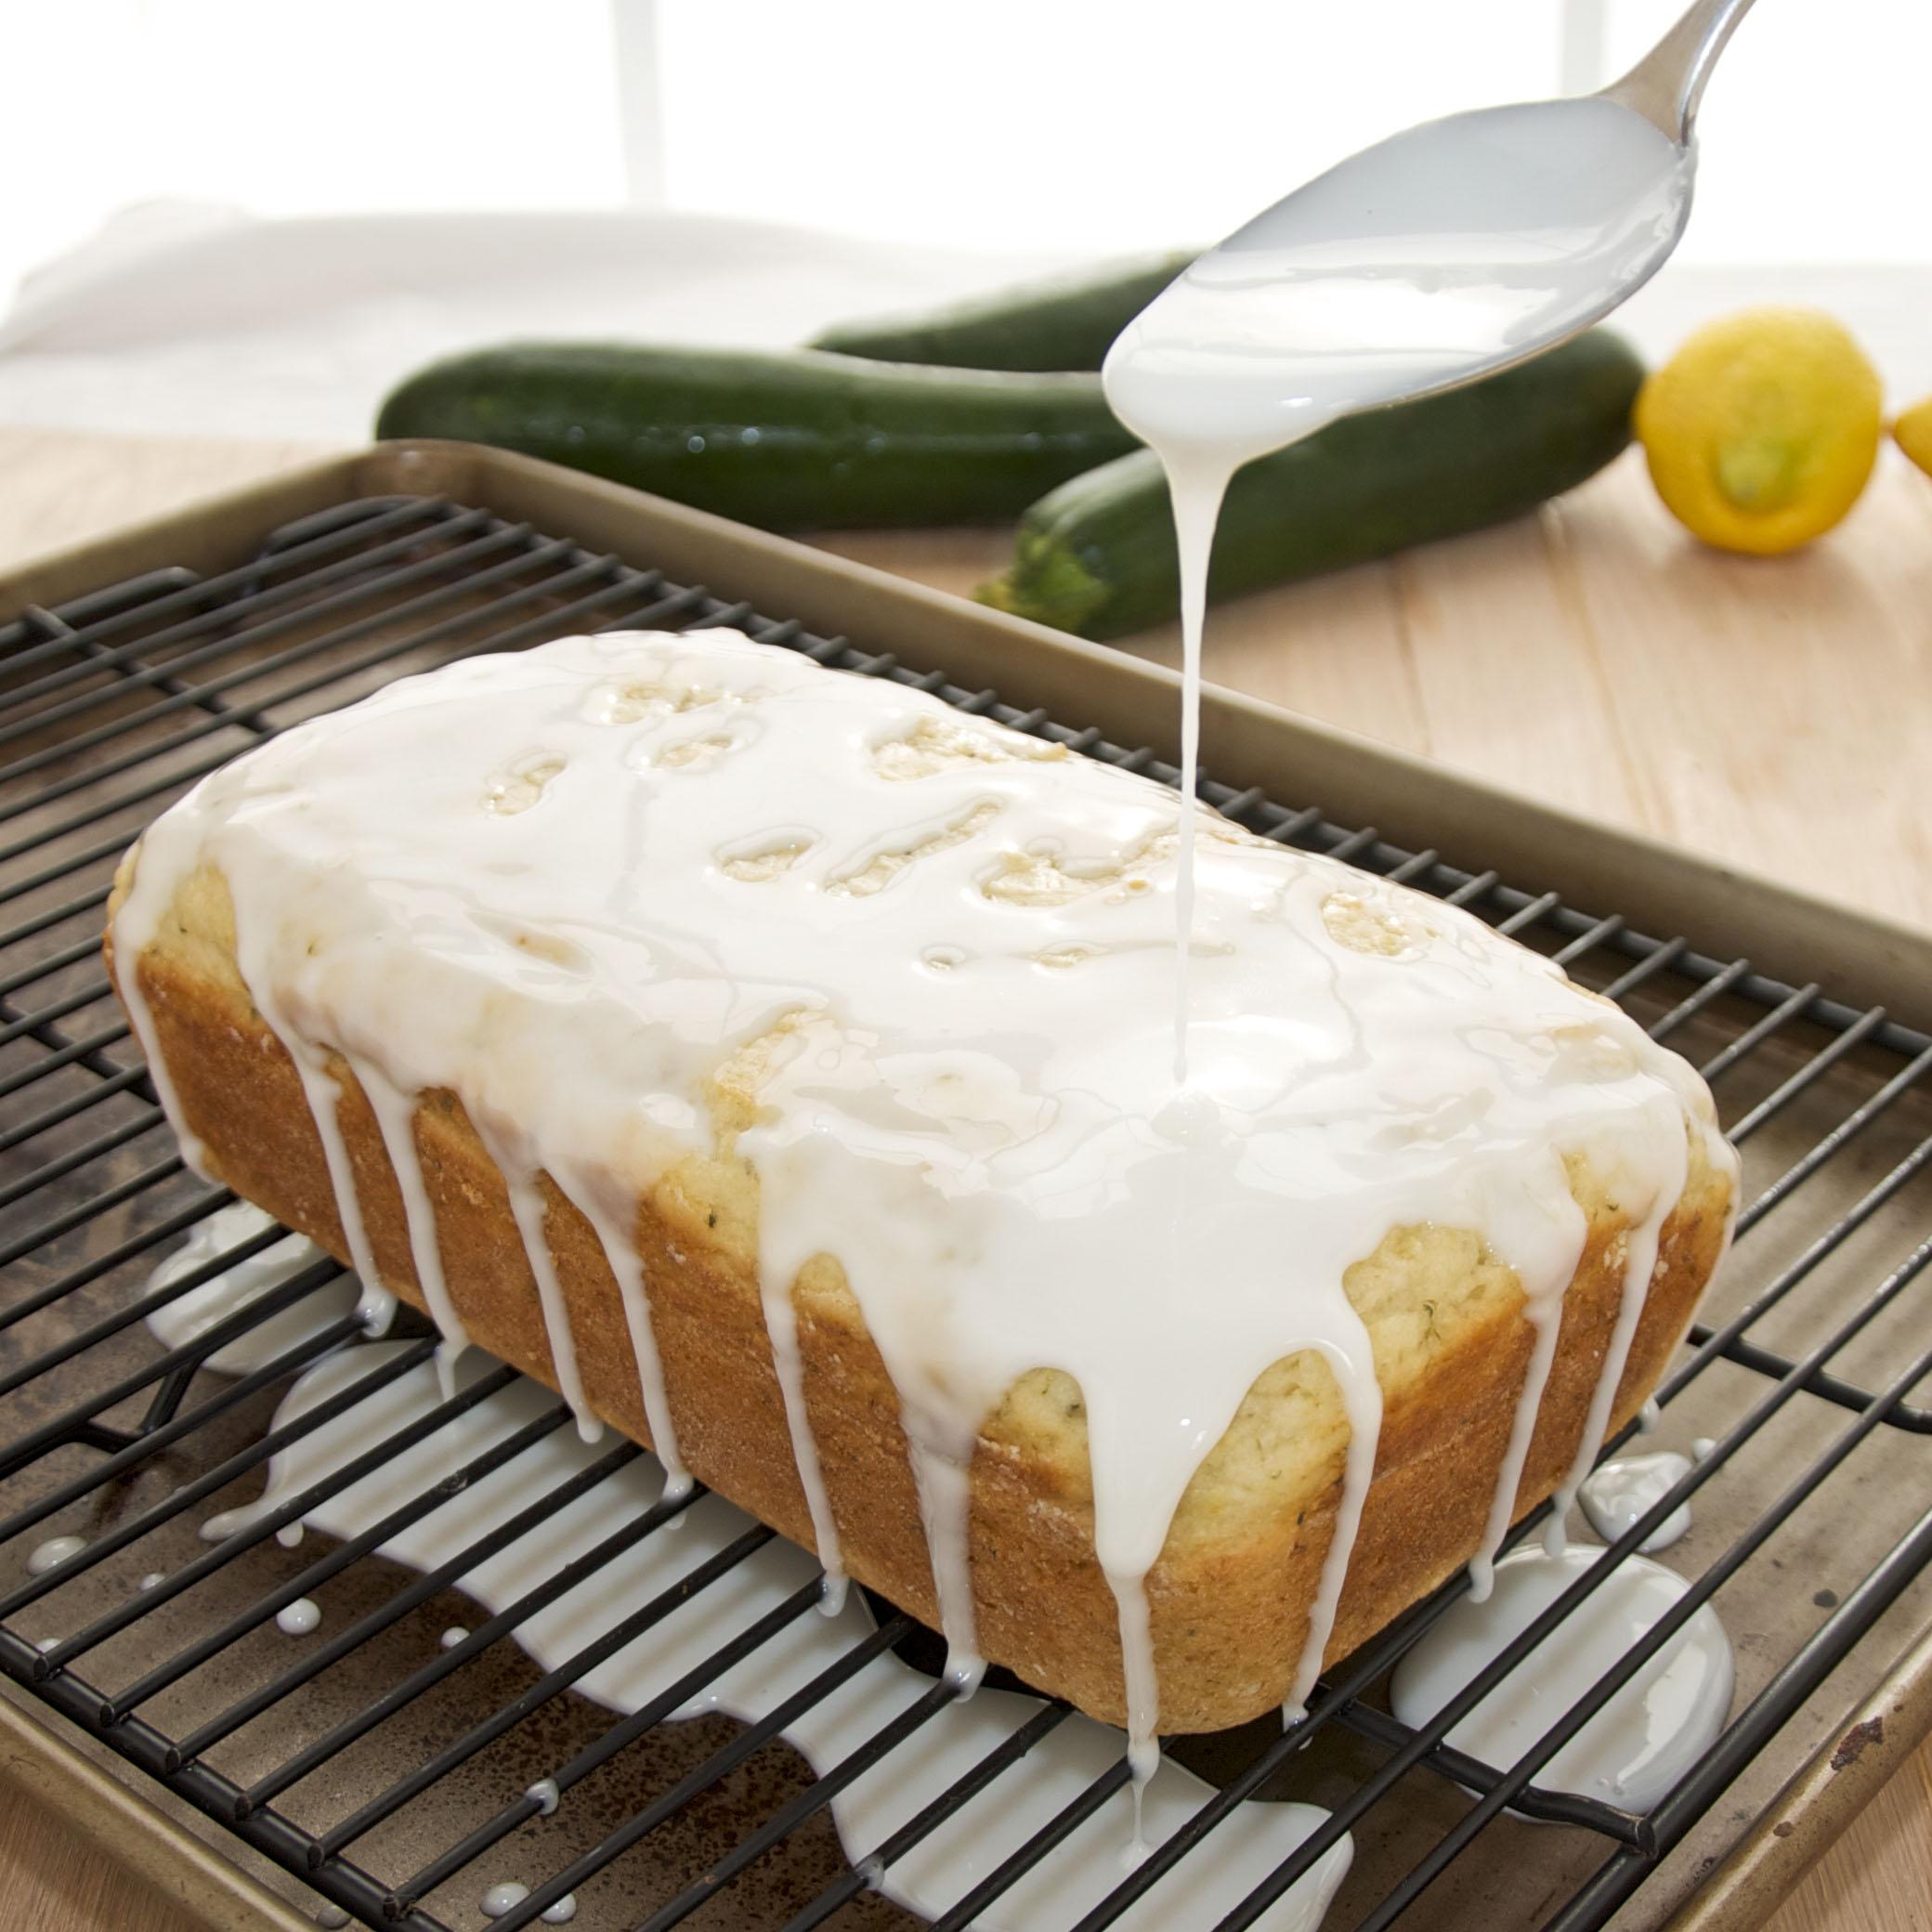 Sweet lemon glaze